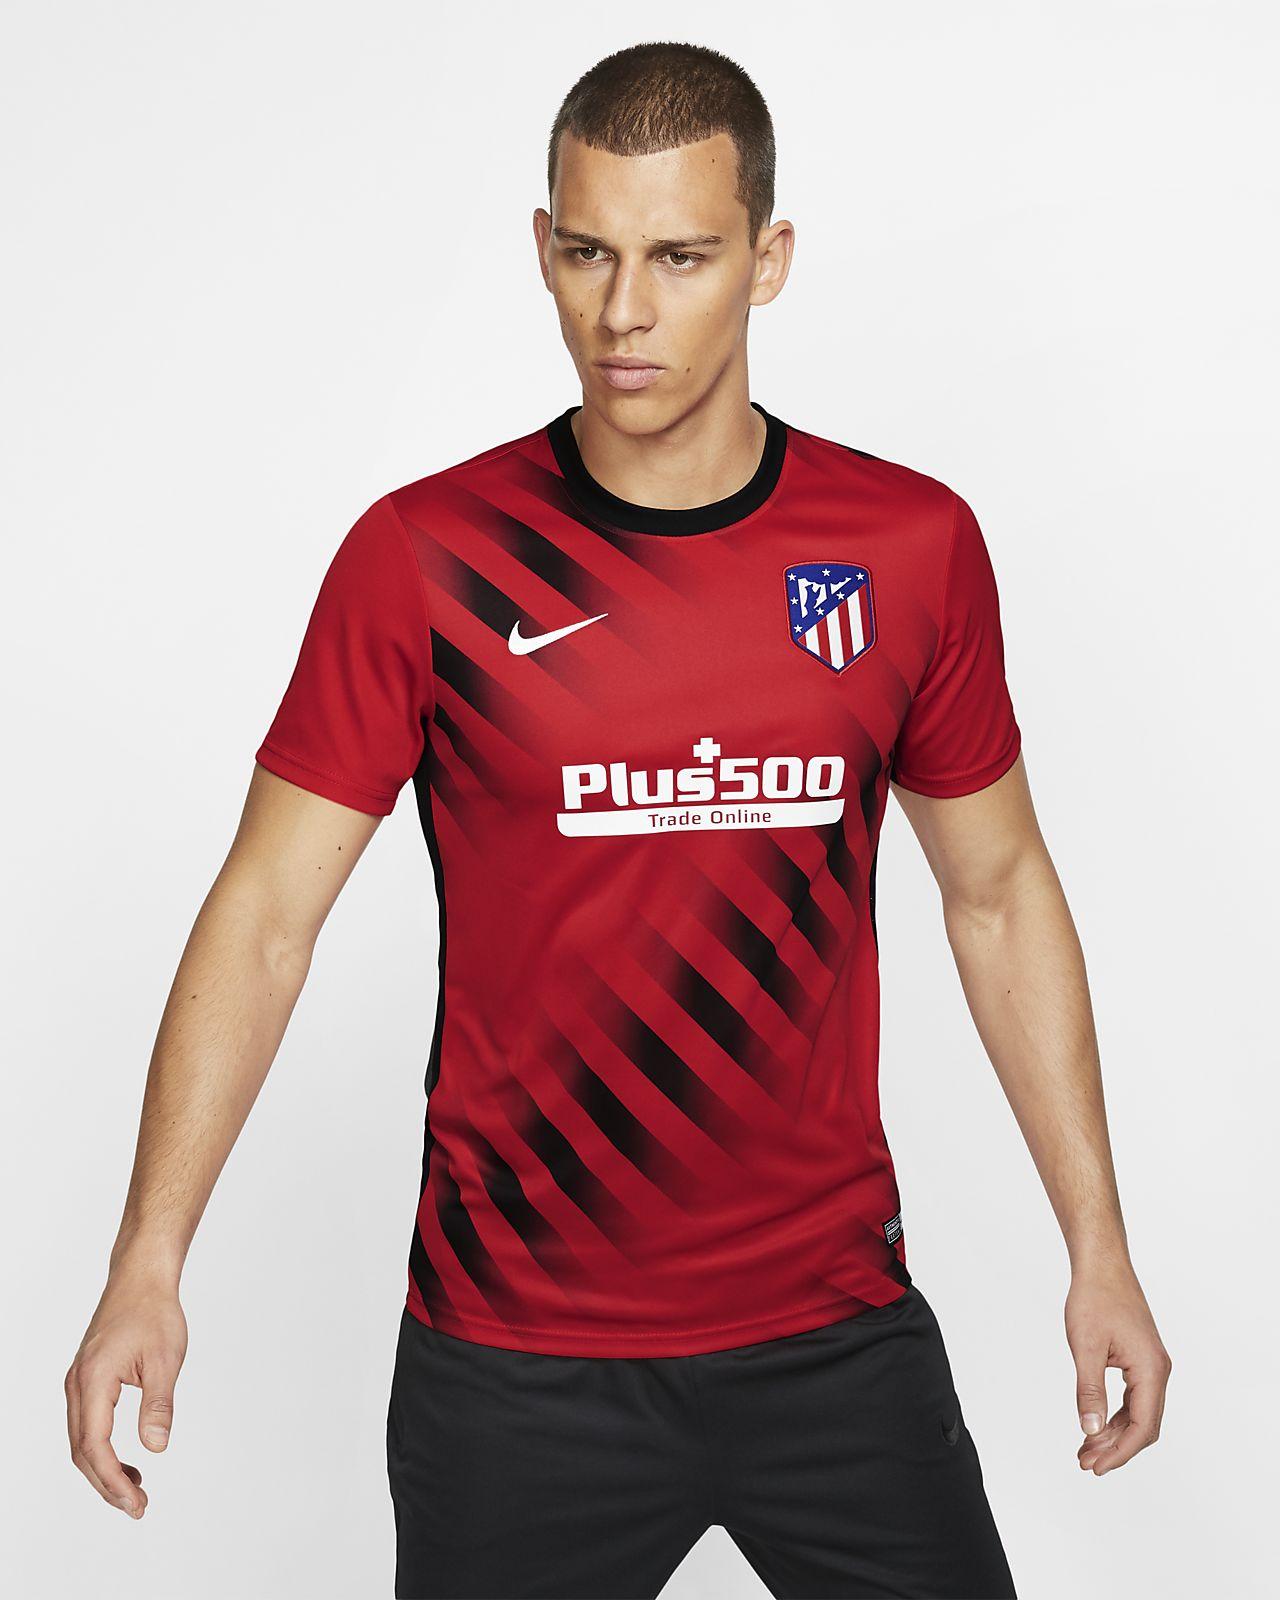 Nike Dri-FIT Atlético de Madrid Men's Short-Sleeve Football Top